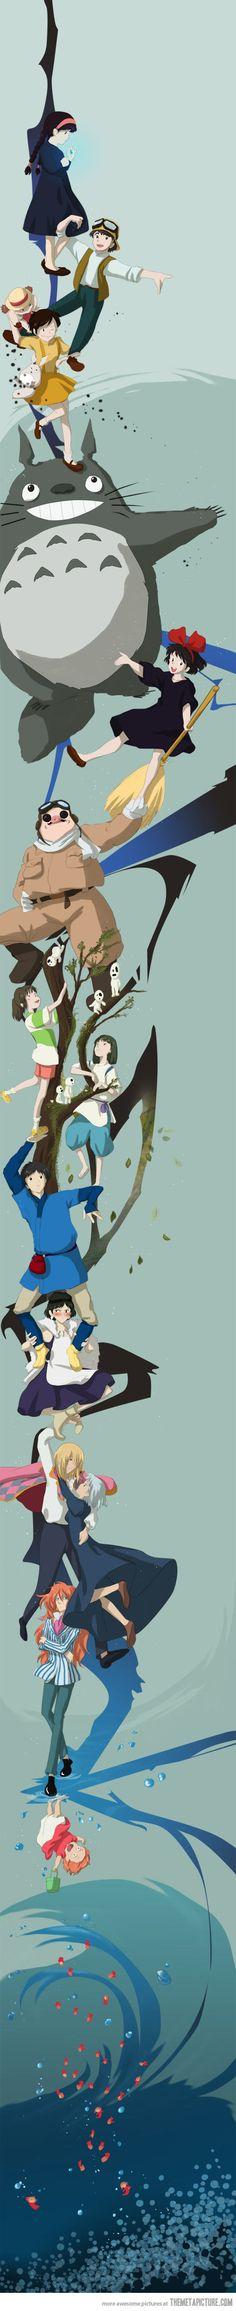 My Neighbor Totoro totoro Crossover Ghibli is love Tonari no Totoro Ghibli studio ghibli Ponyo mononoke hime Howl's Moving Castle Hayao Miyazaki, Art Studio Ghibli, Durarara, Manga Anime, Anime Art, Sad Anime, Geeks, Desu Desu, Film D'animation